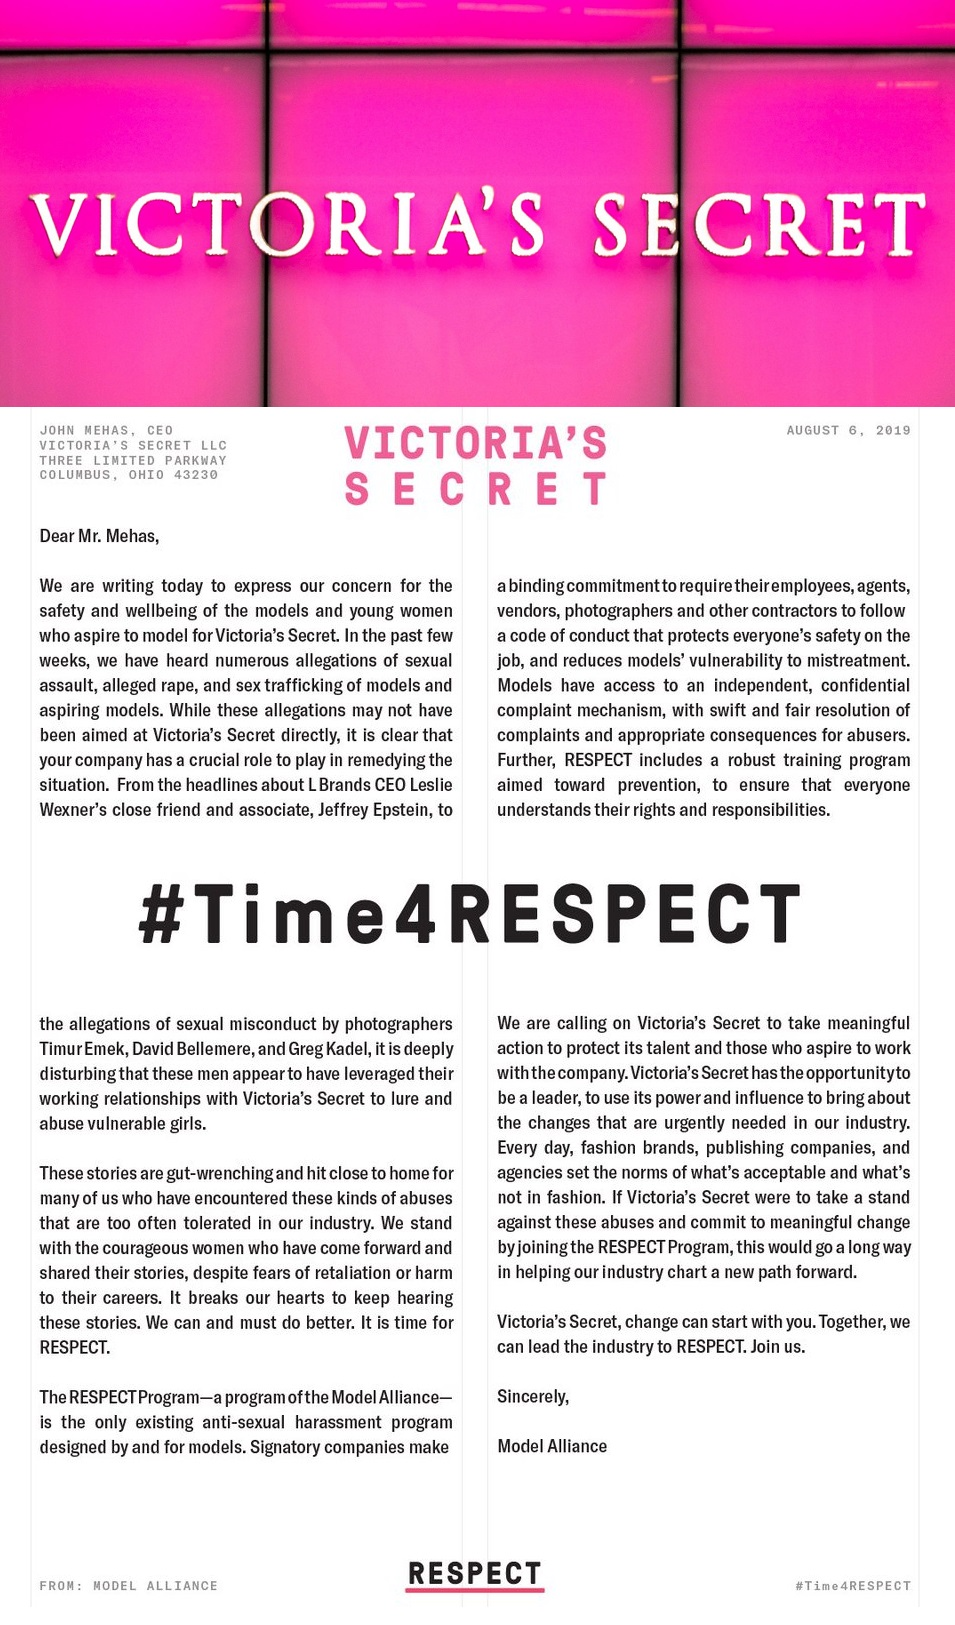 victorias-secret-#Time4RESPECT.jpg